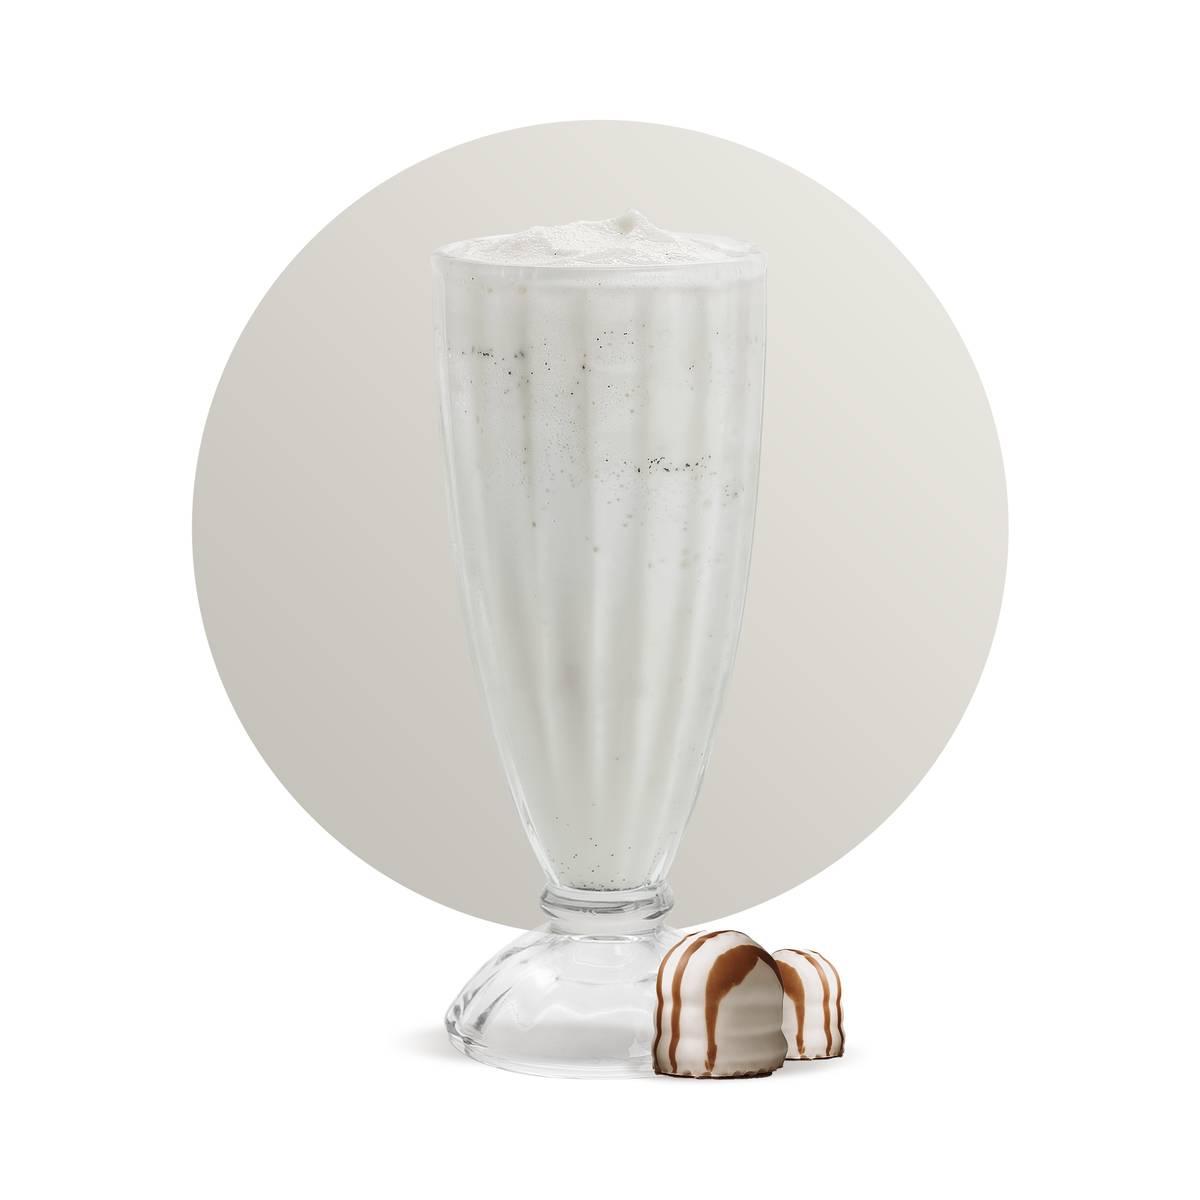 French Vanilla Milkshake Drink Recipe